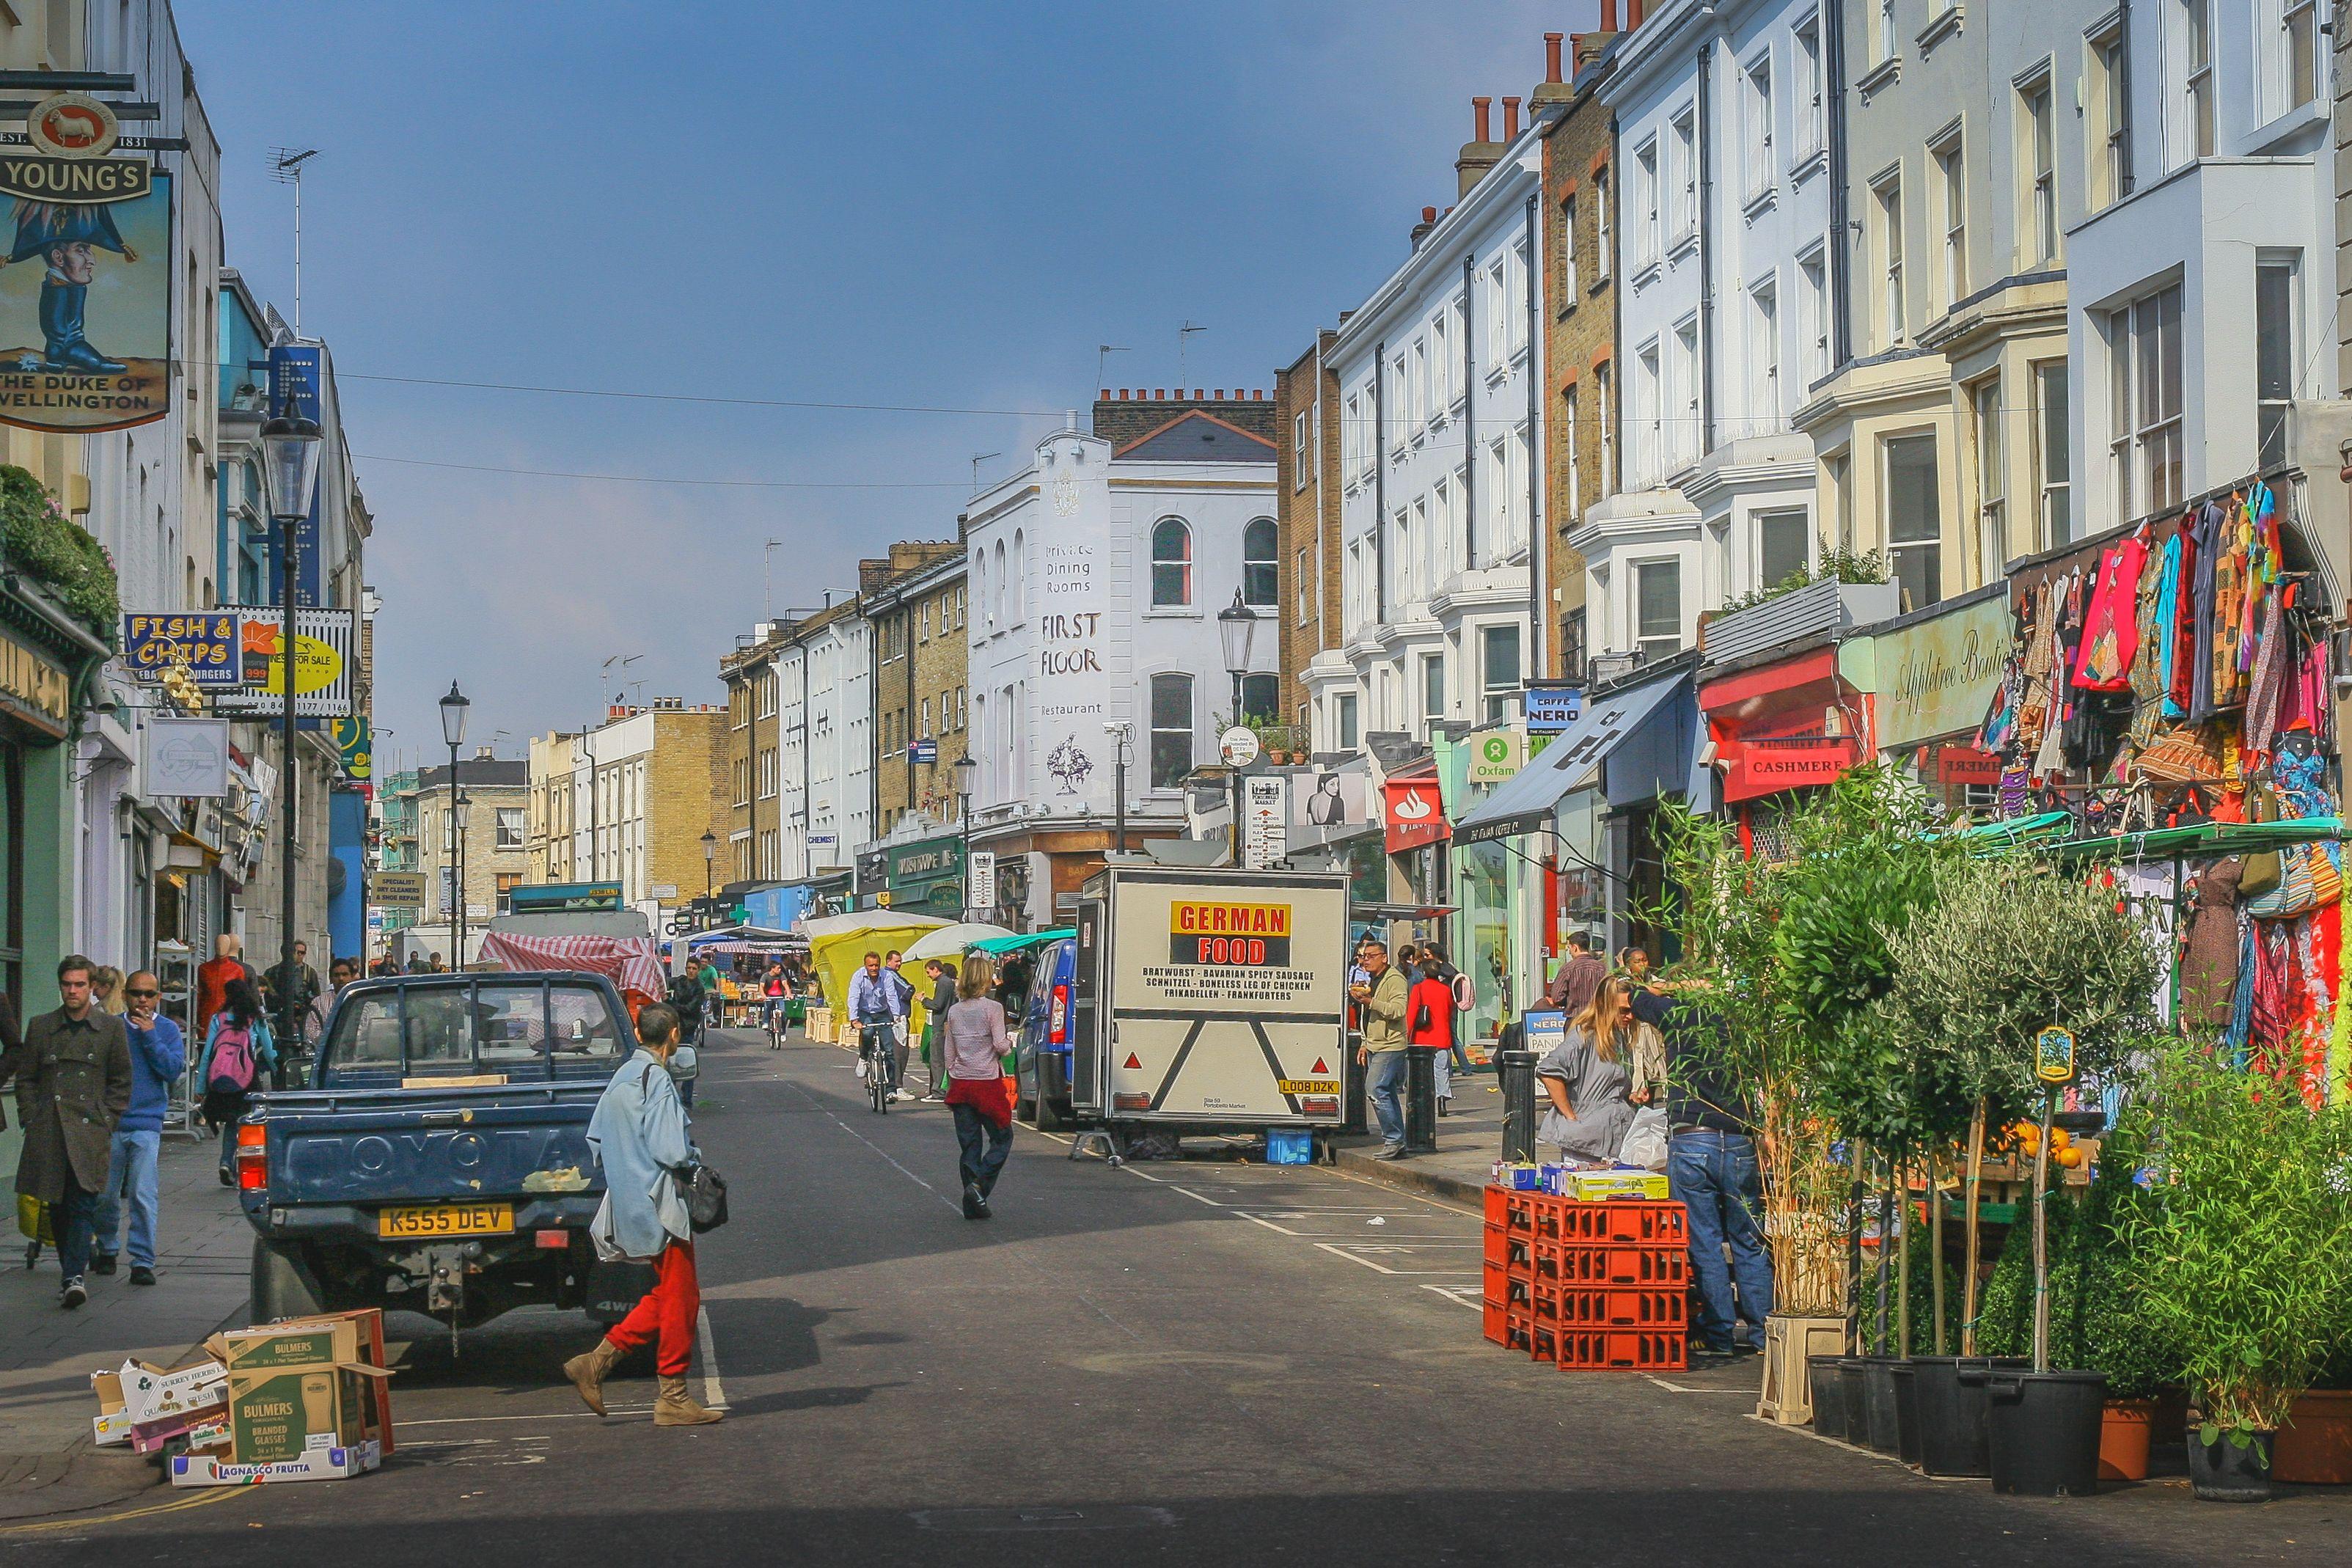 Notting Hill & Portobello Road, London